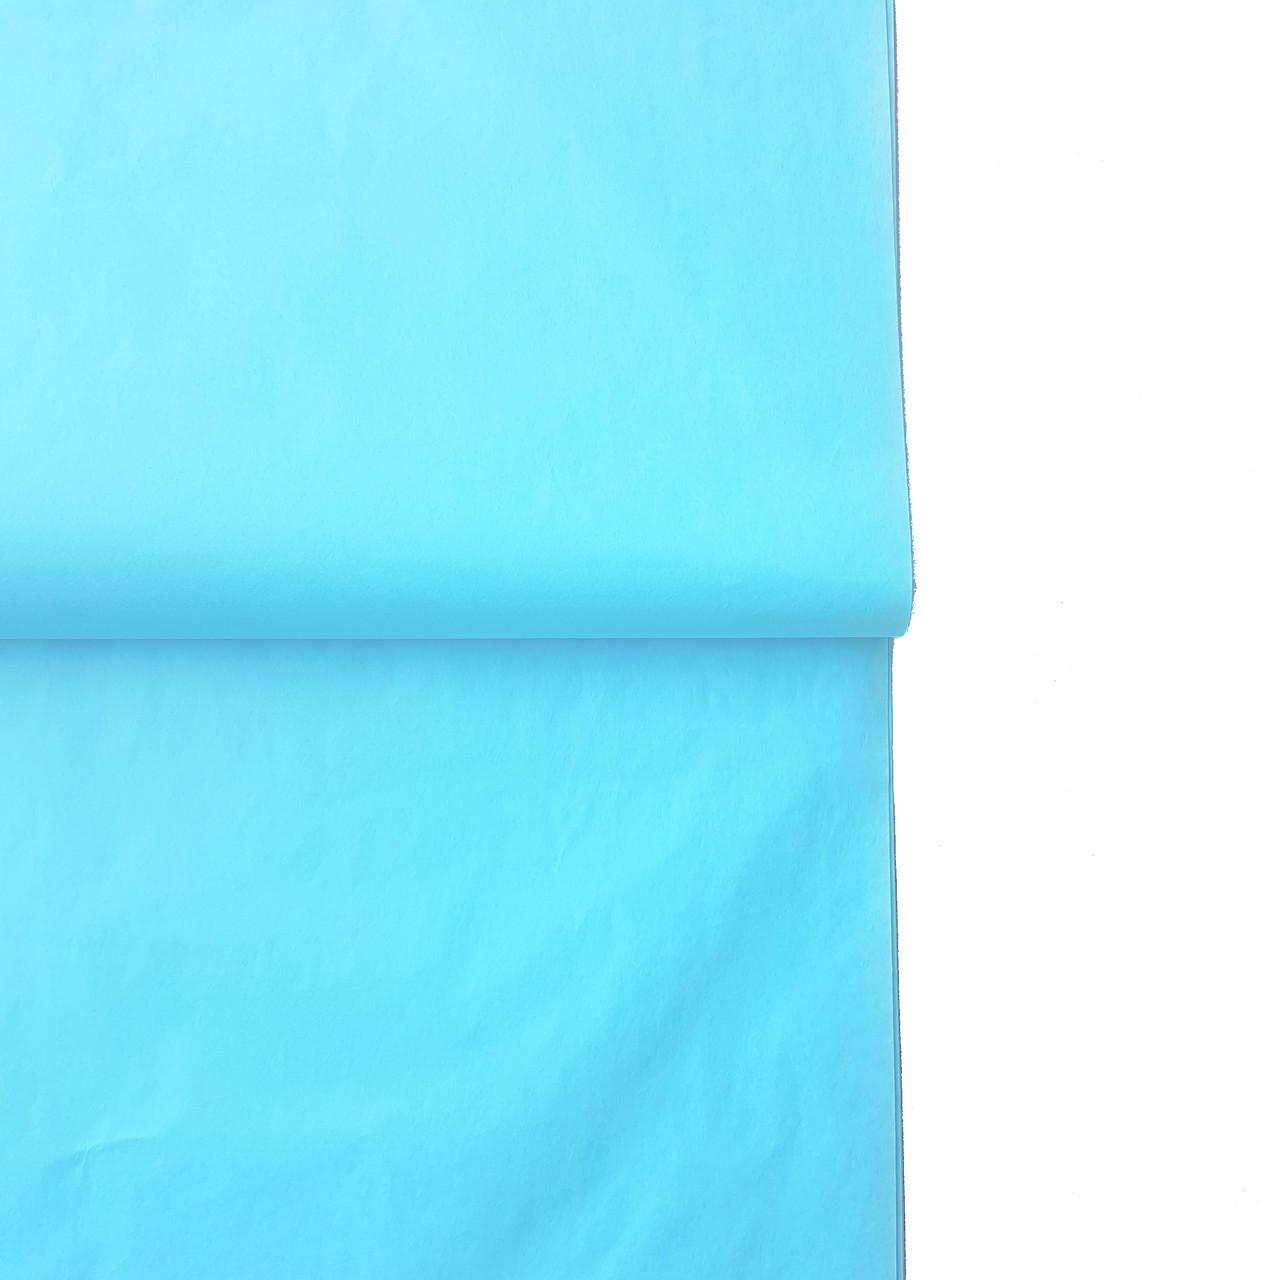 Бумага тишью голубая 100шт.